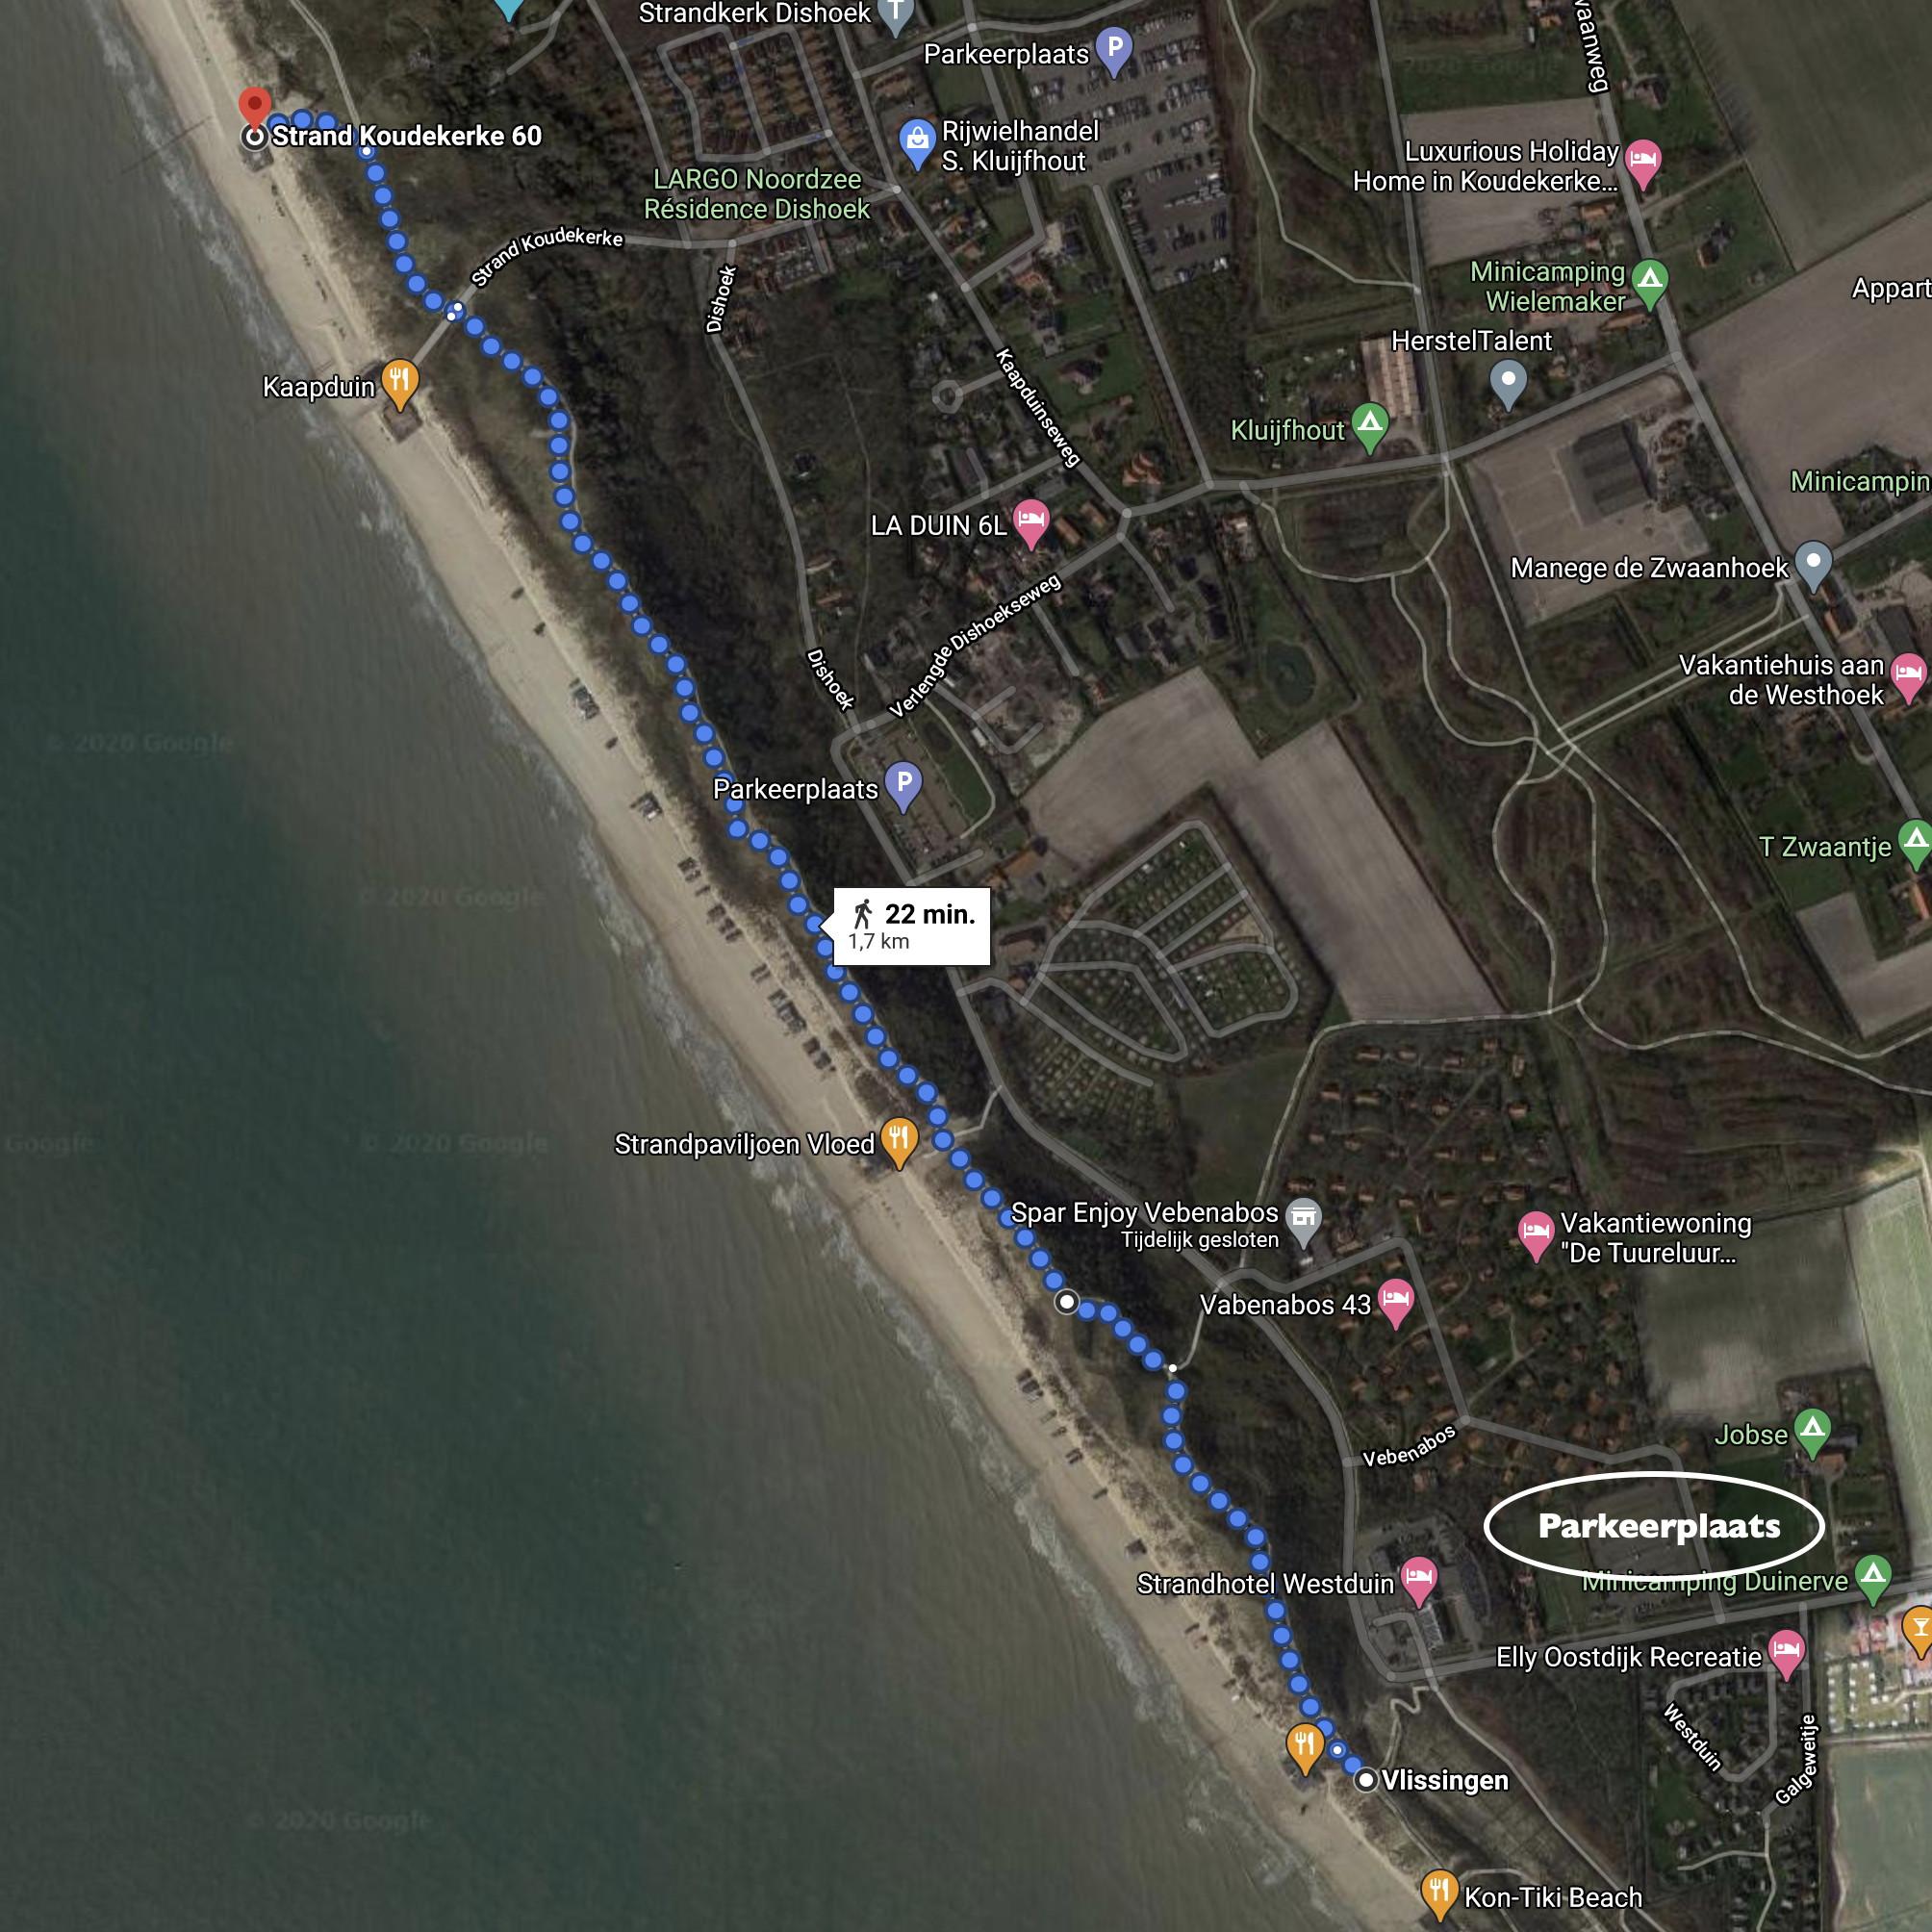 strand wandeling route dishoek